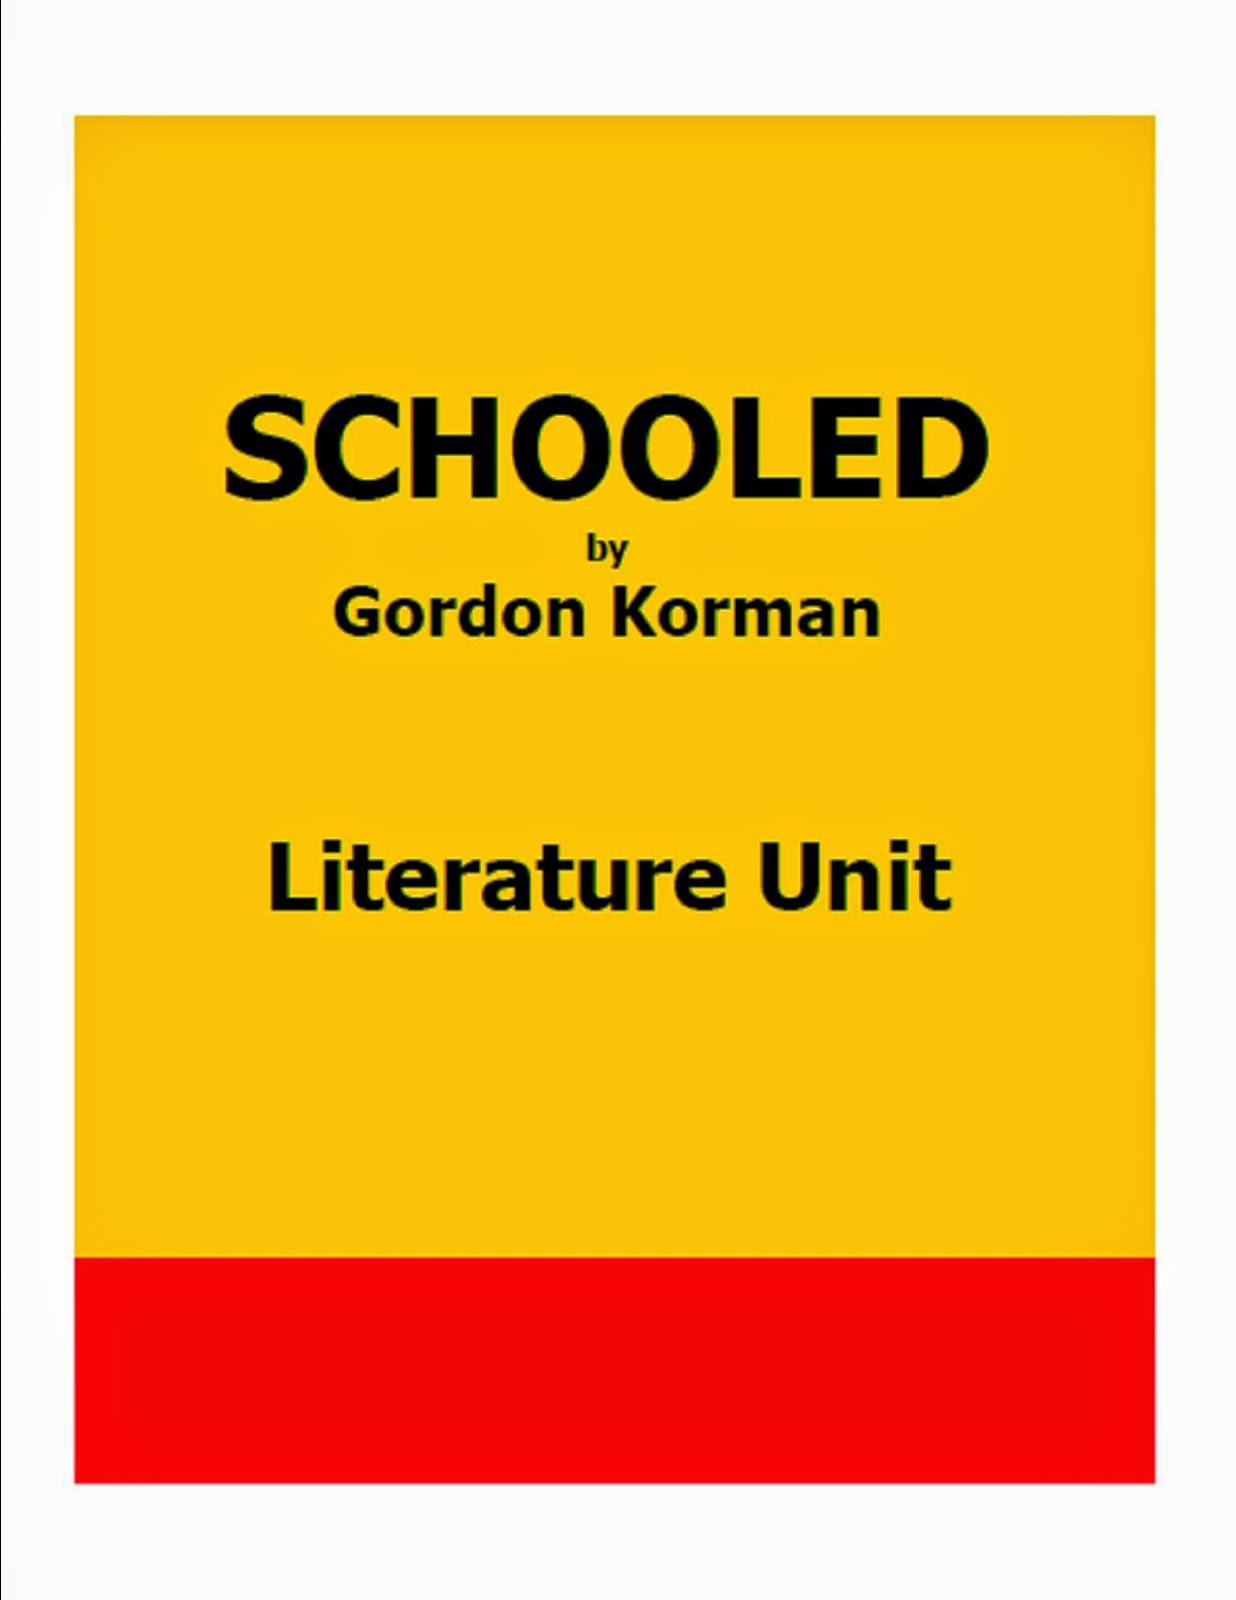 http://www.teacherspayteachers.com/Product/SCHOOLED-by-Gordon-Korman-Literature-Unit-Flash-Freebie-137293